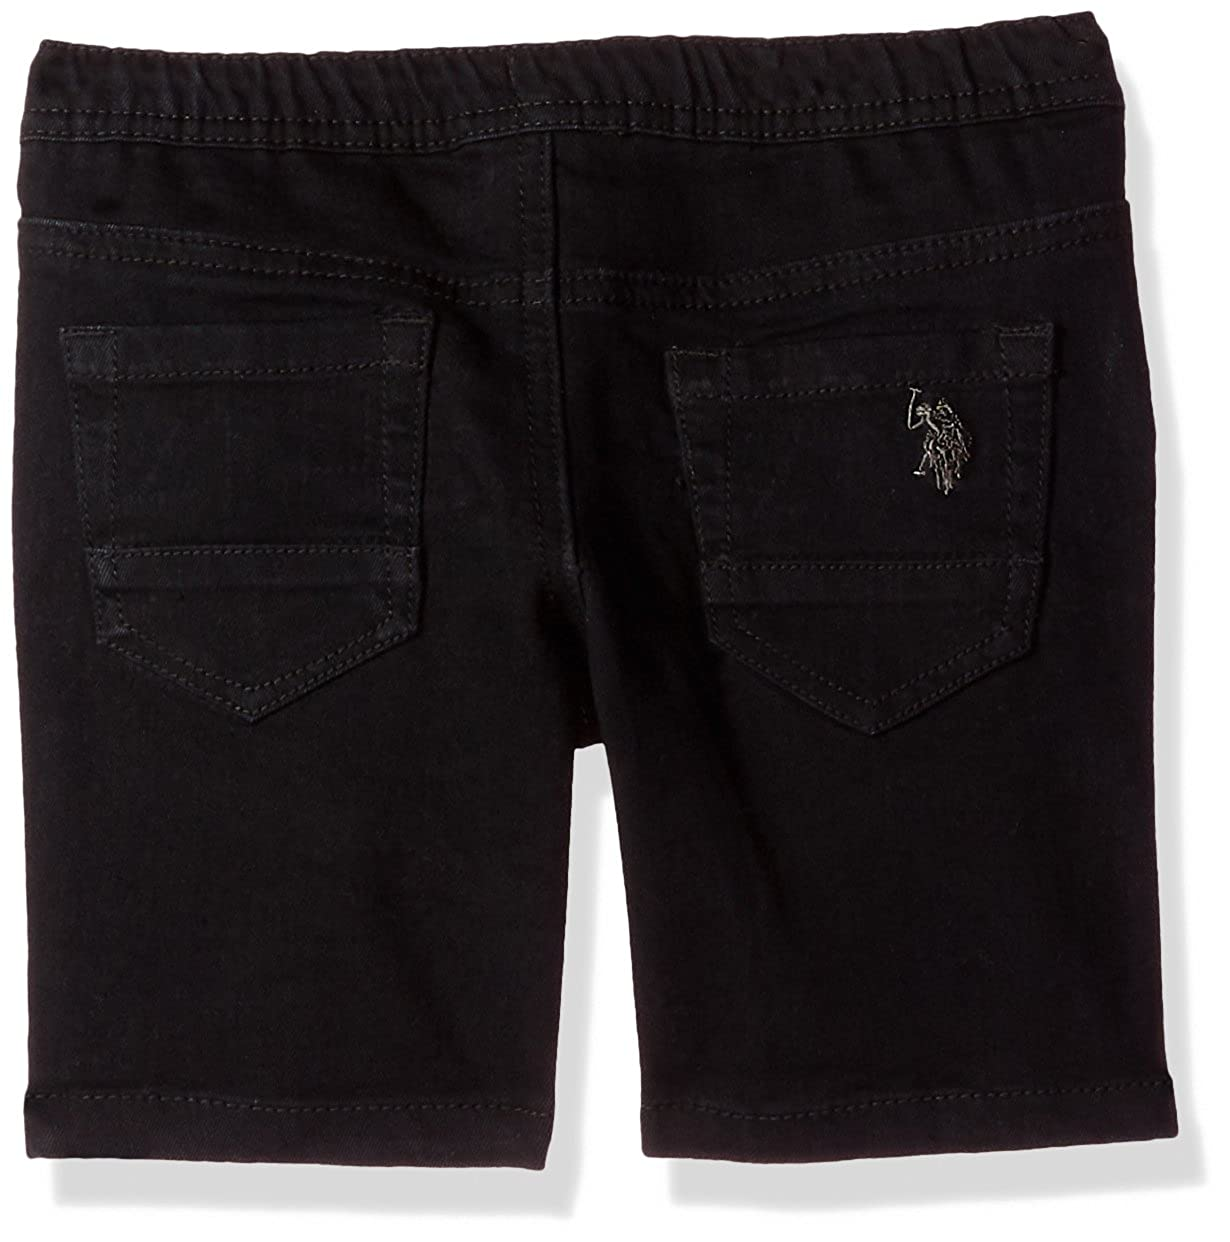 U.S Boys Short RG30 Polo Assn